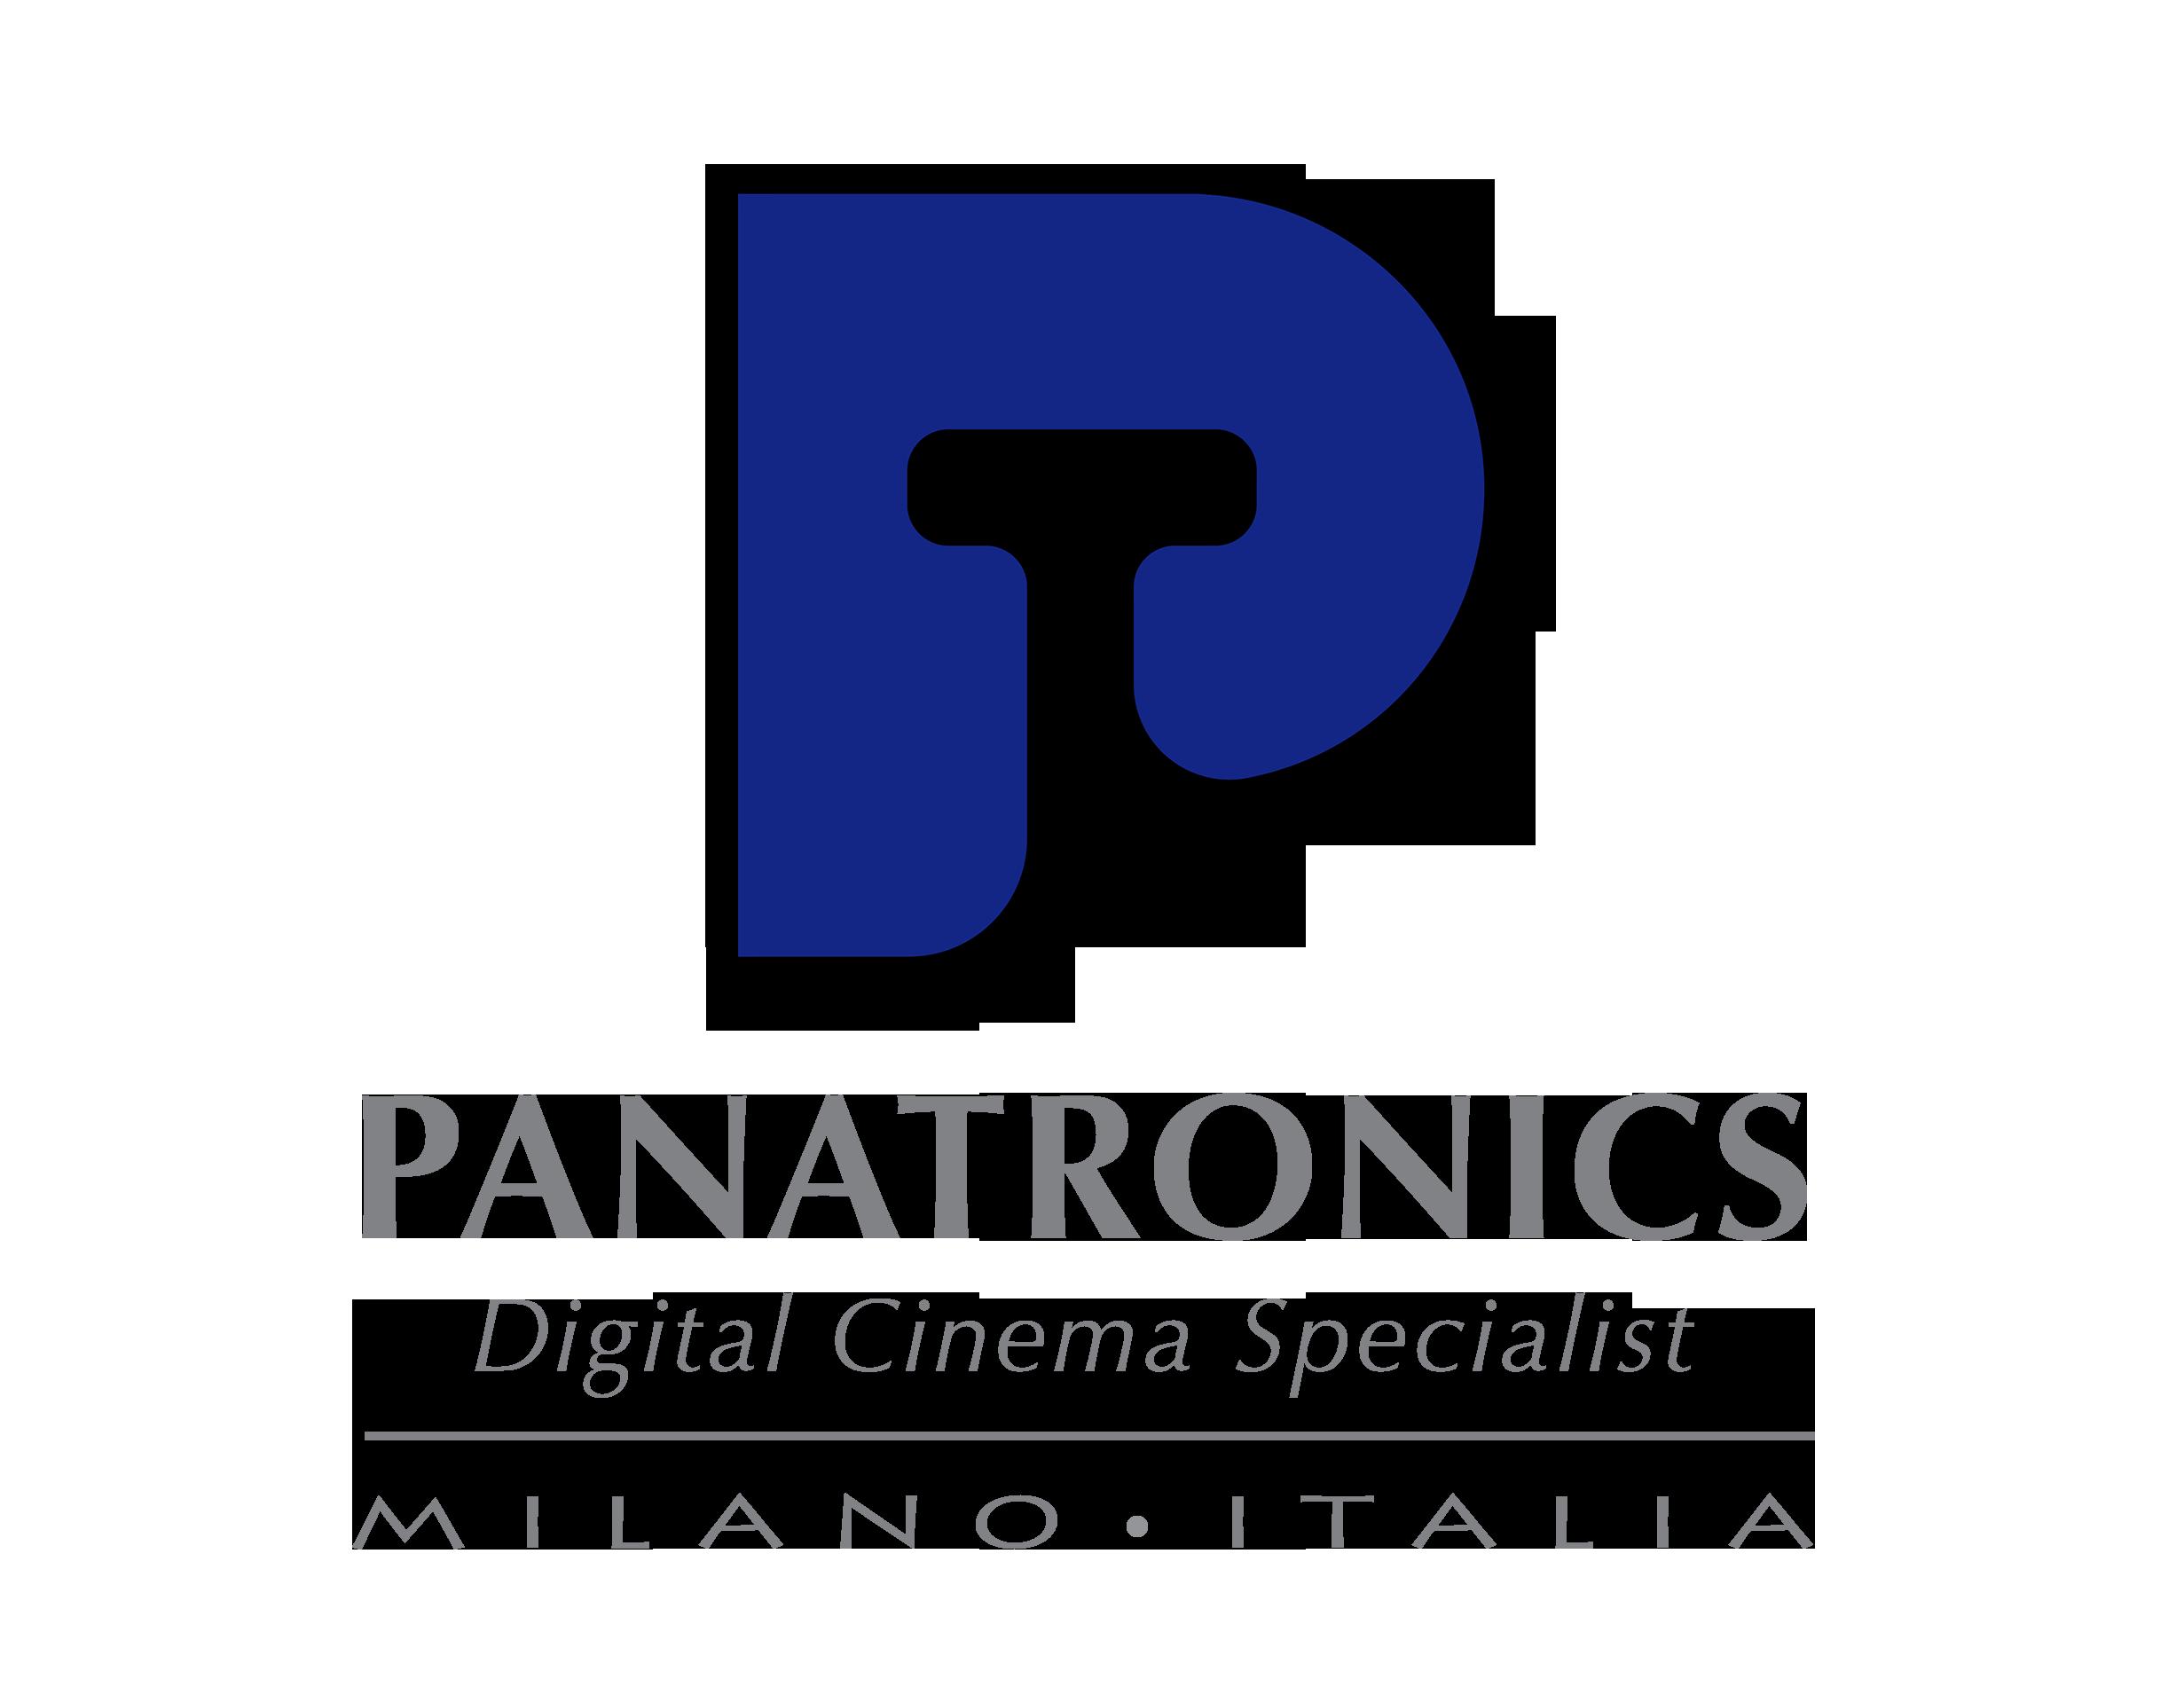 "PANATRONICS <span class=""wordpress-store-locator-store-in"">Store in Milan</span>"